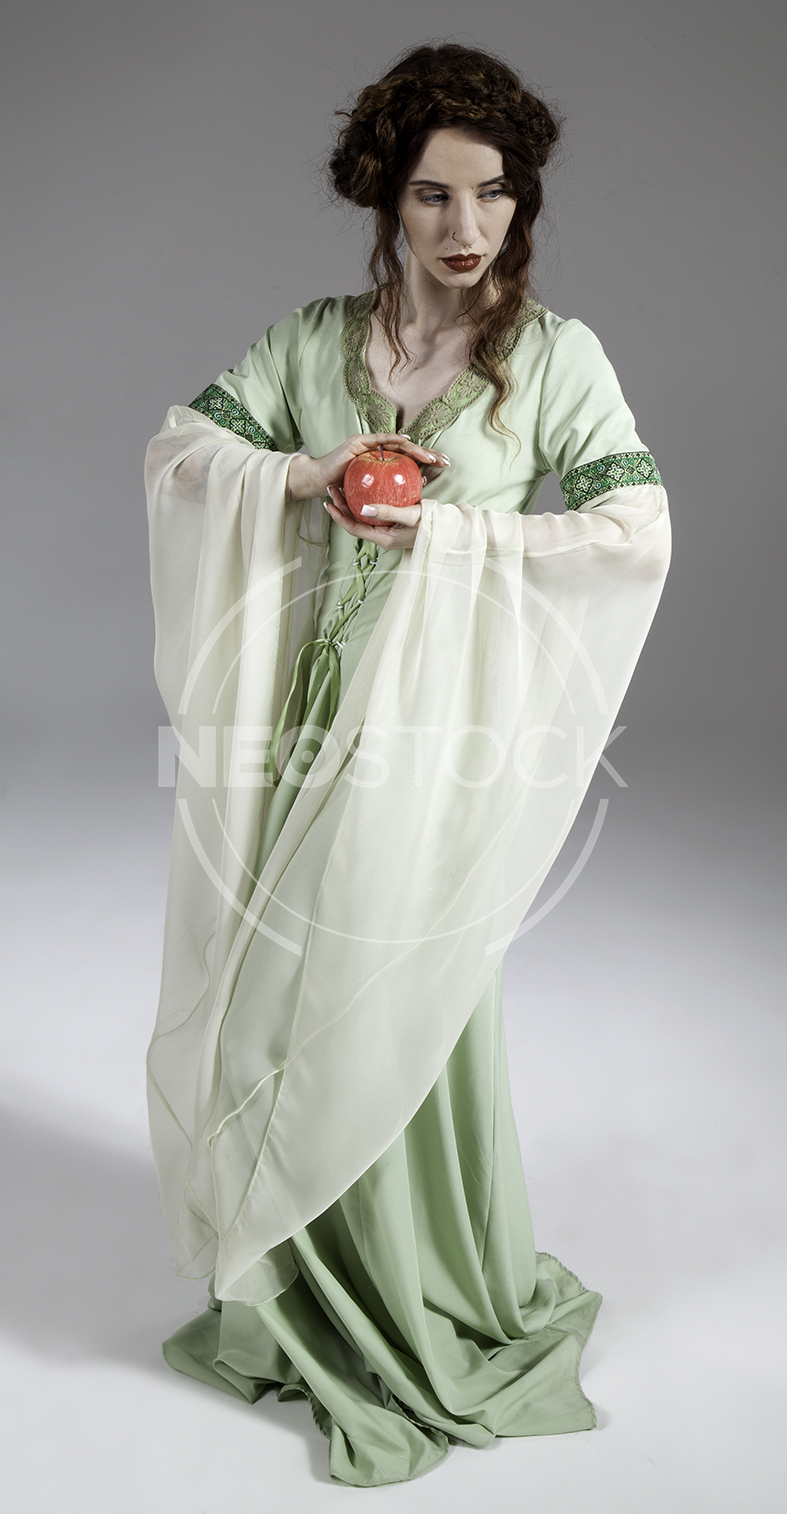 NeoStock - Emma Pre Raphaelite - Stock Photography IV